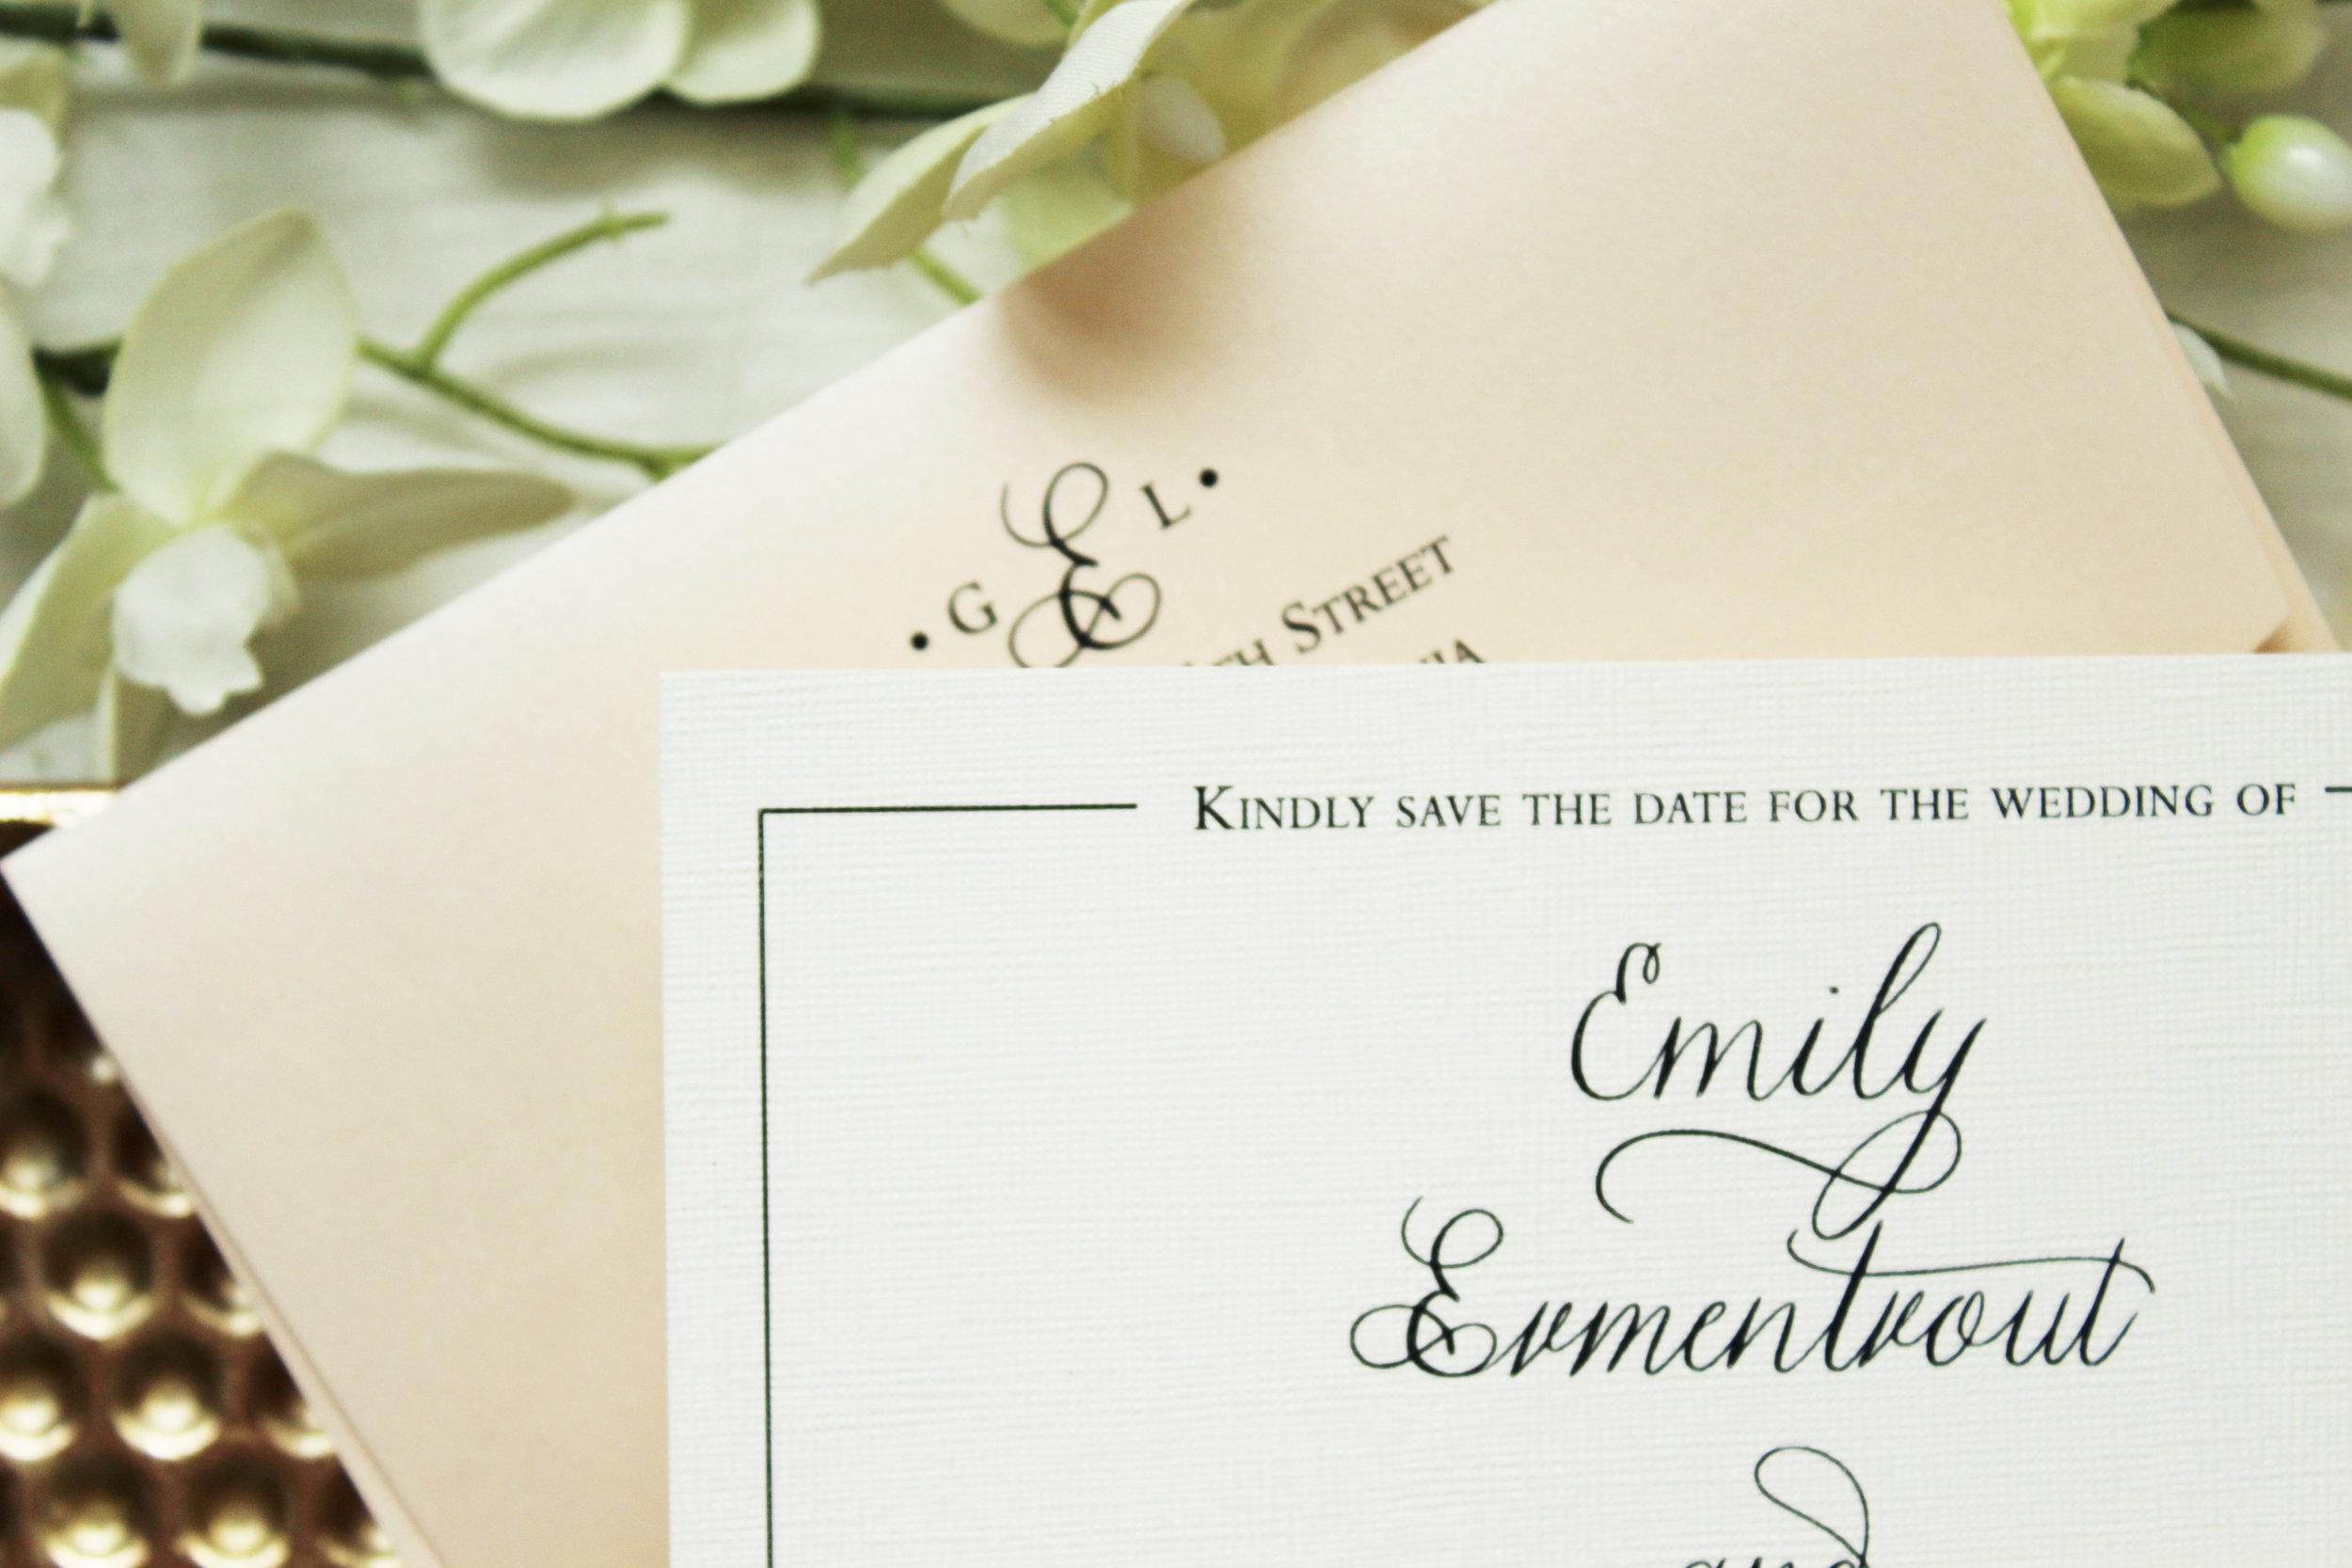 Central PA, York PA, JesSmith Designs, custom, wedding, invitations, bridal, announcements, save the date, baby, hanover, calligraphy, baltimore, wedding invitations, lancaster, gettysburg_3005.jpg